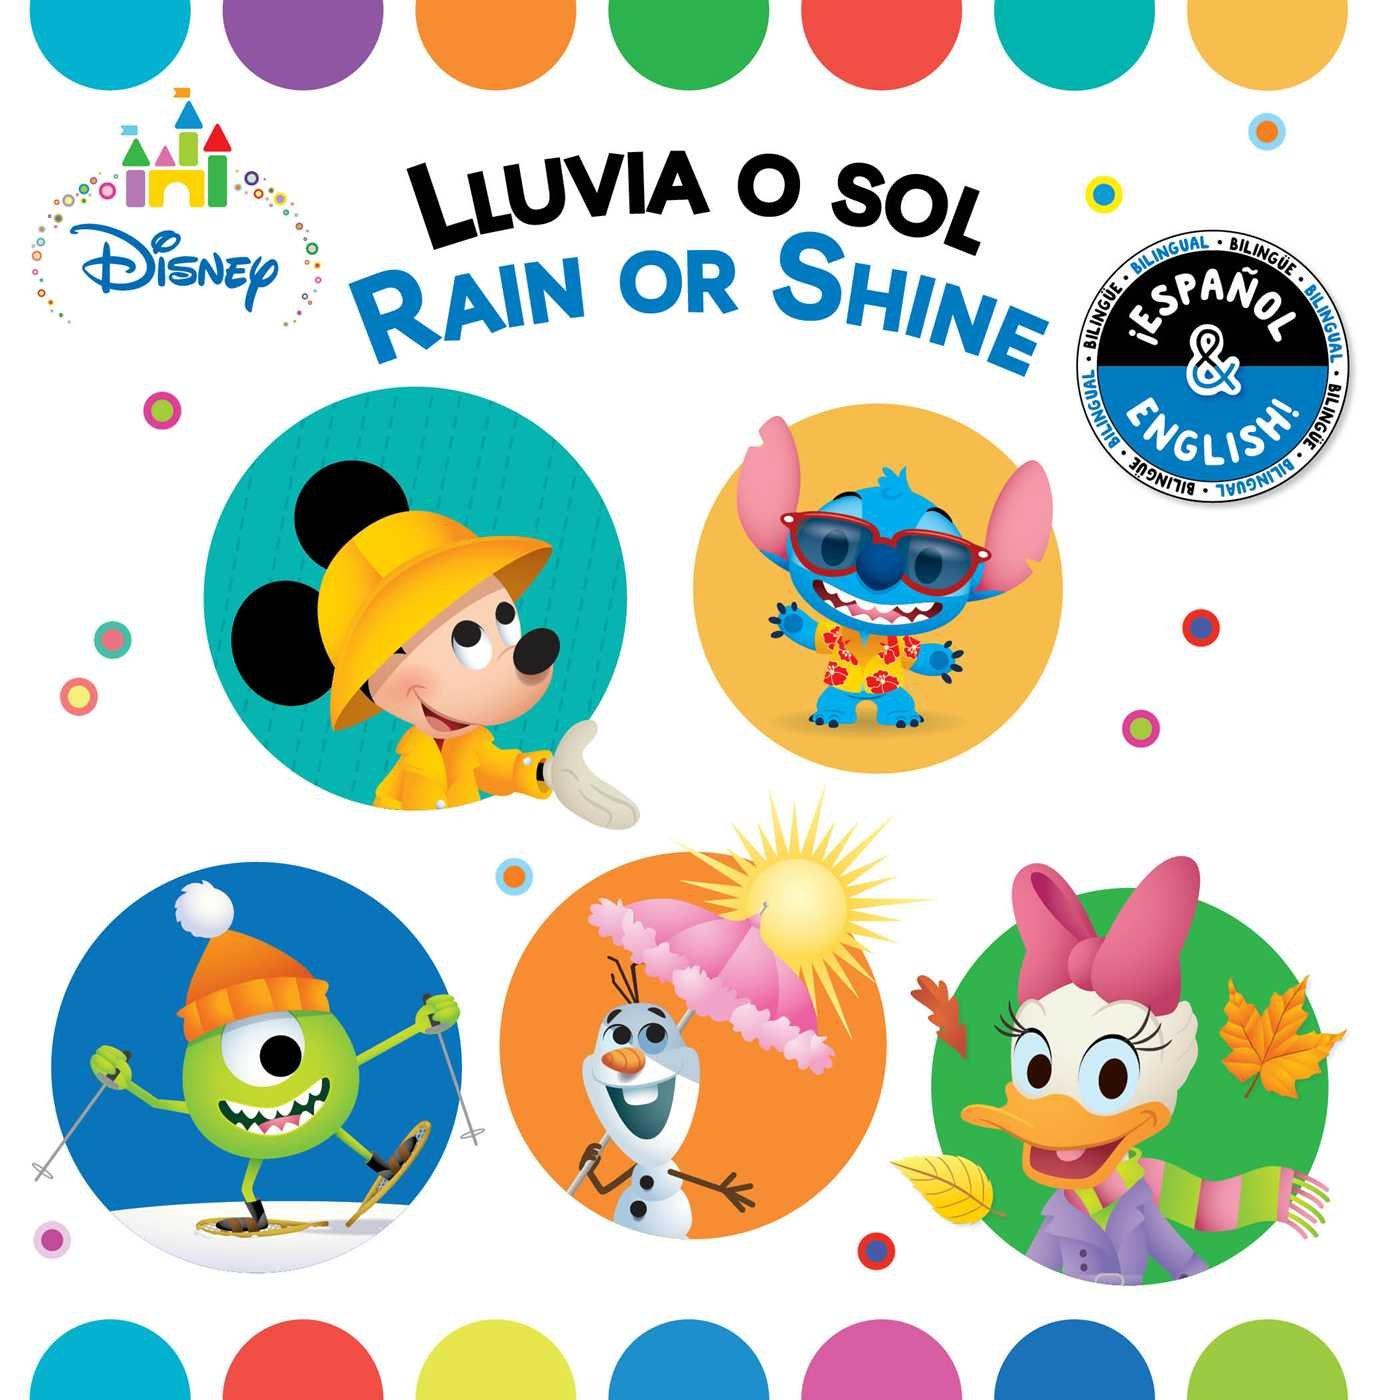 Amazon.com: Rain or Shine / Lluvia o sol (English-Spanish) (Disney Baby) (Disney Bilingual) (9781499807936): Stevie Stack, Laura Collado Piriz: Books